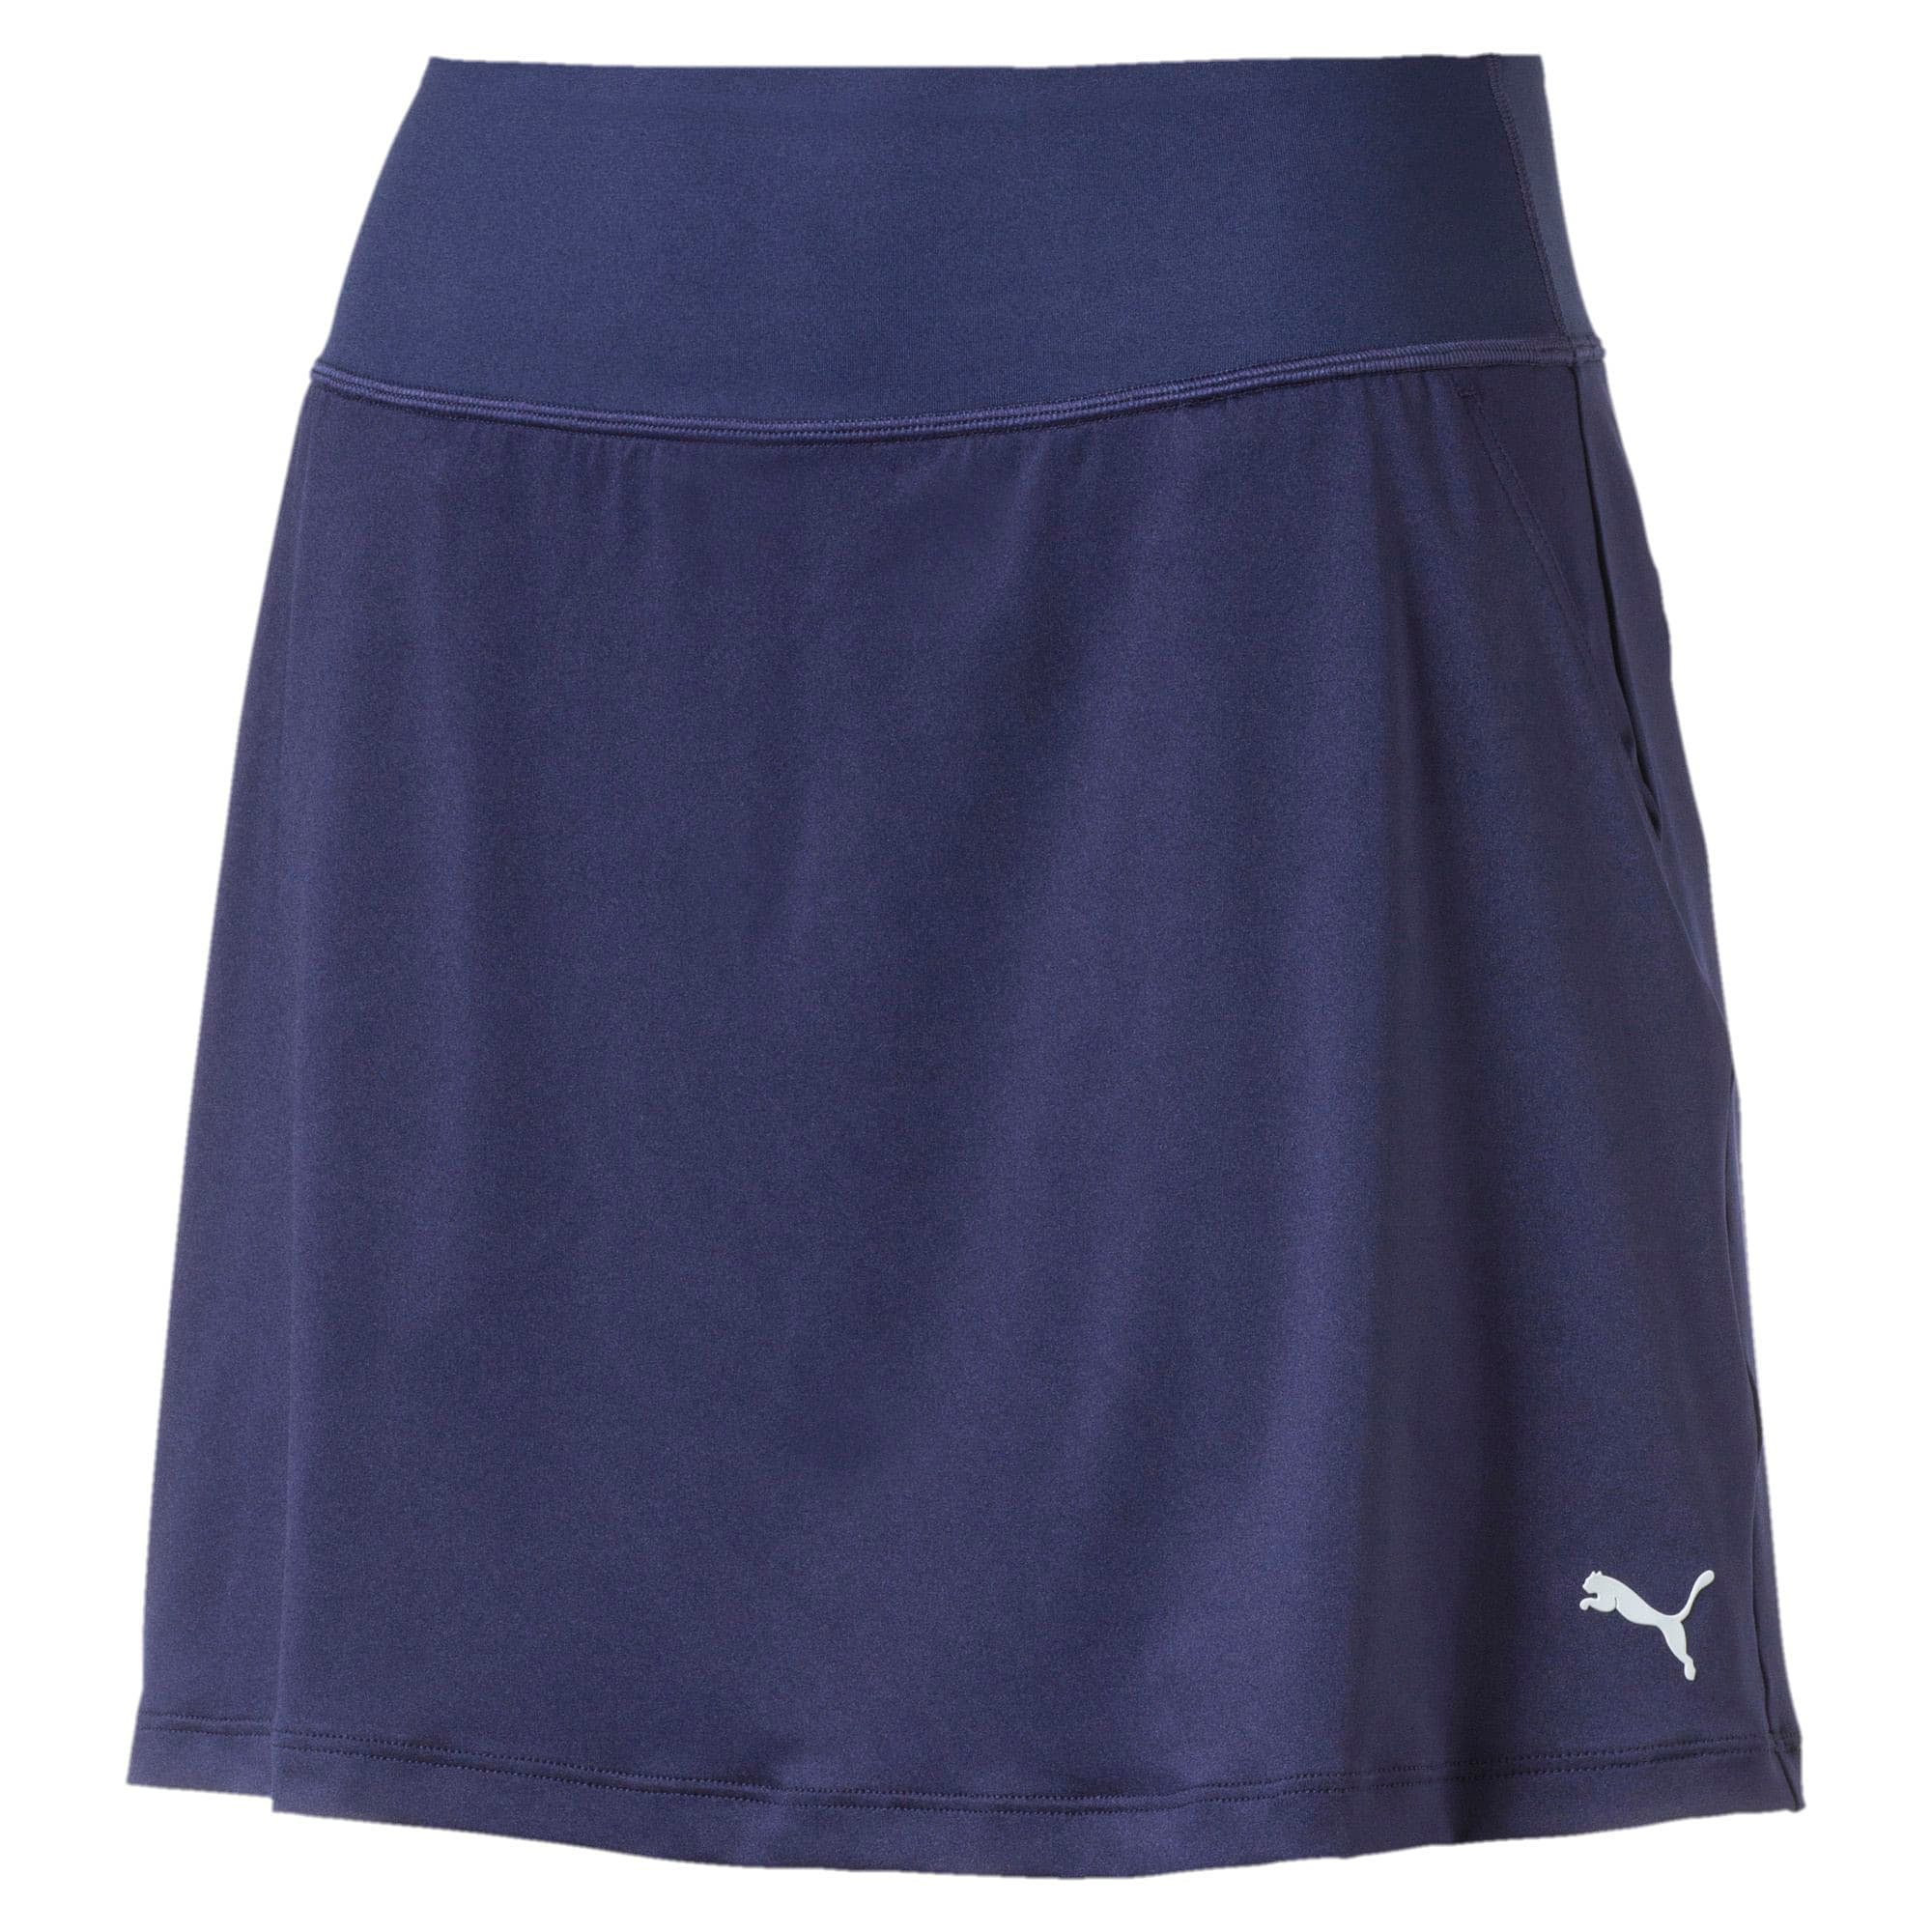 Thumbnail 1 of Golf Women's PWRSHAPE Solid Knit Skirt, Peacoat, medium